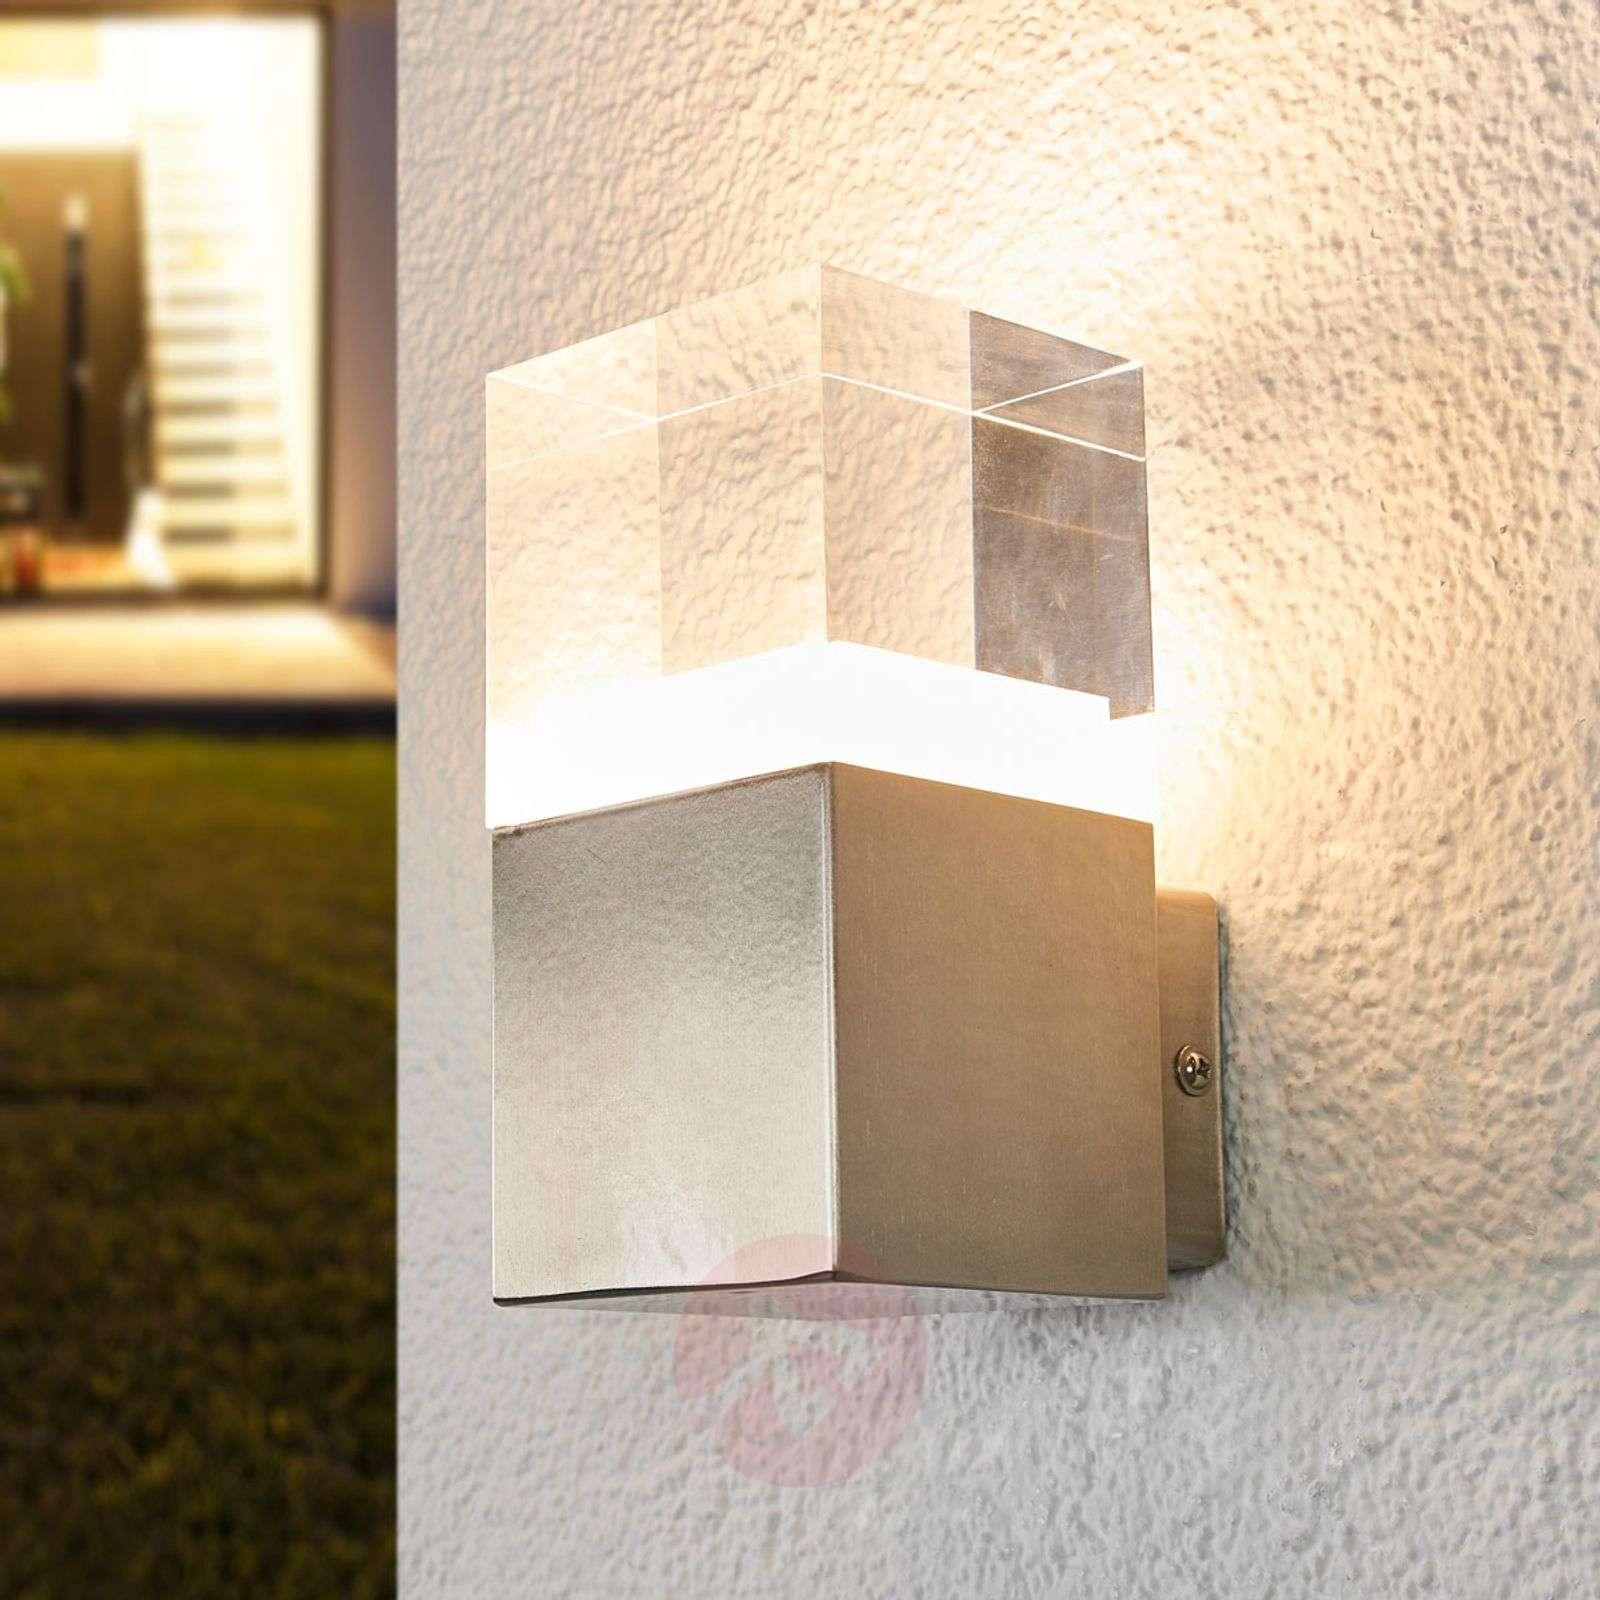 Sierstrip Chroom Badkamer : Nerius stainless steel led outdoor wall light lights.ie